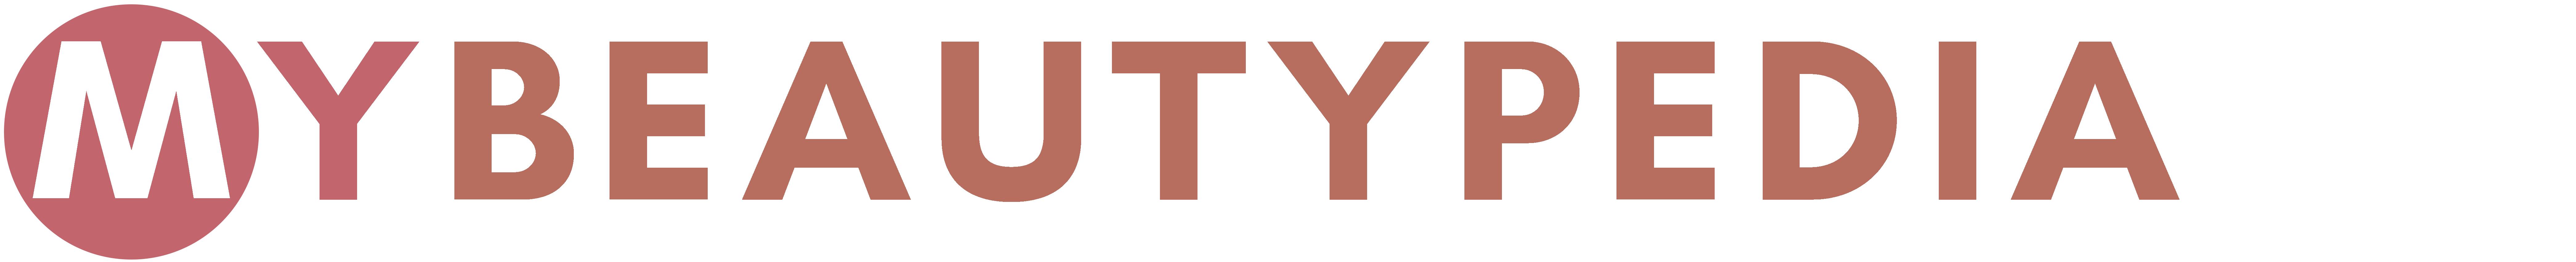 MYBEAUTYPEDIA